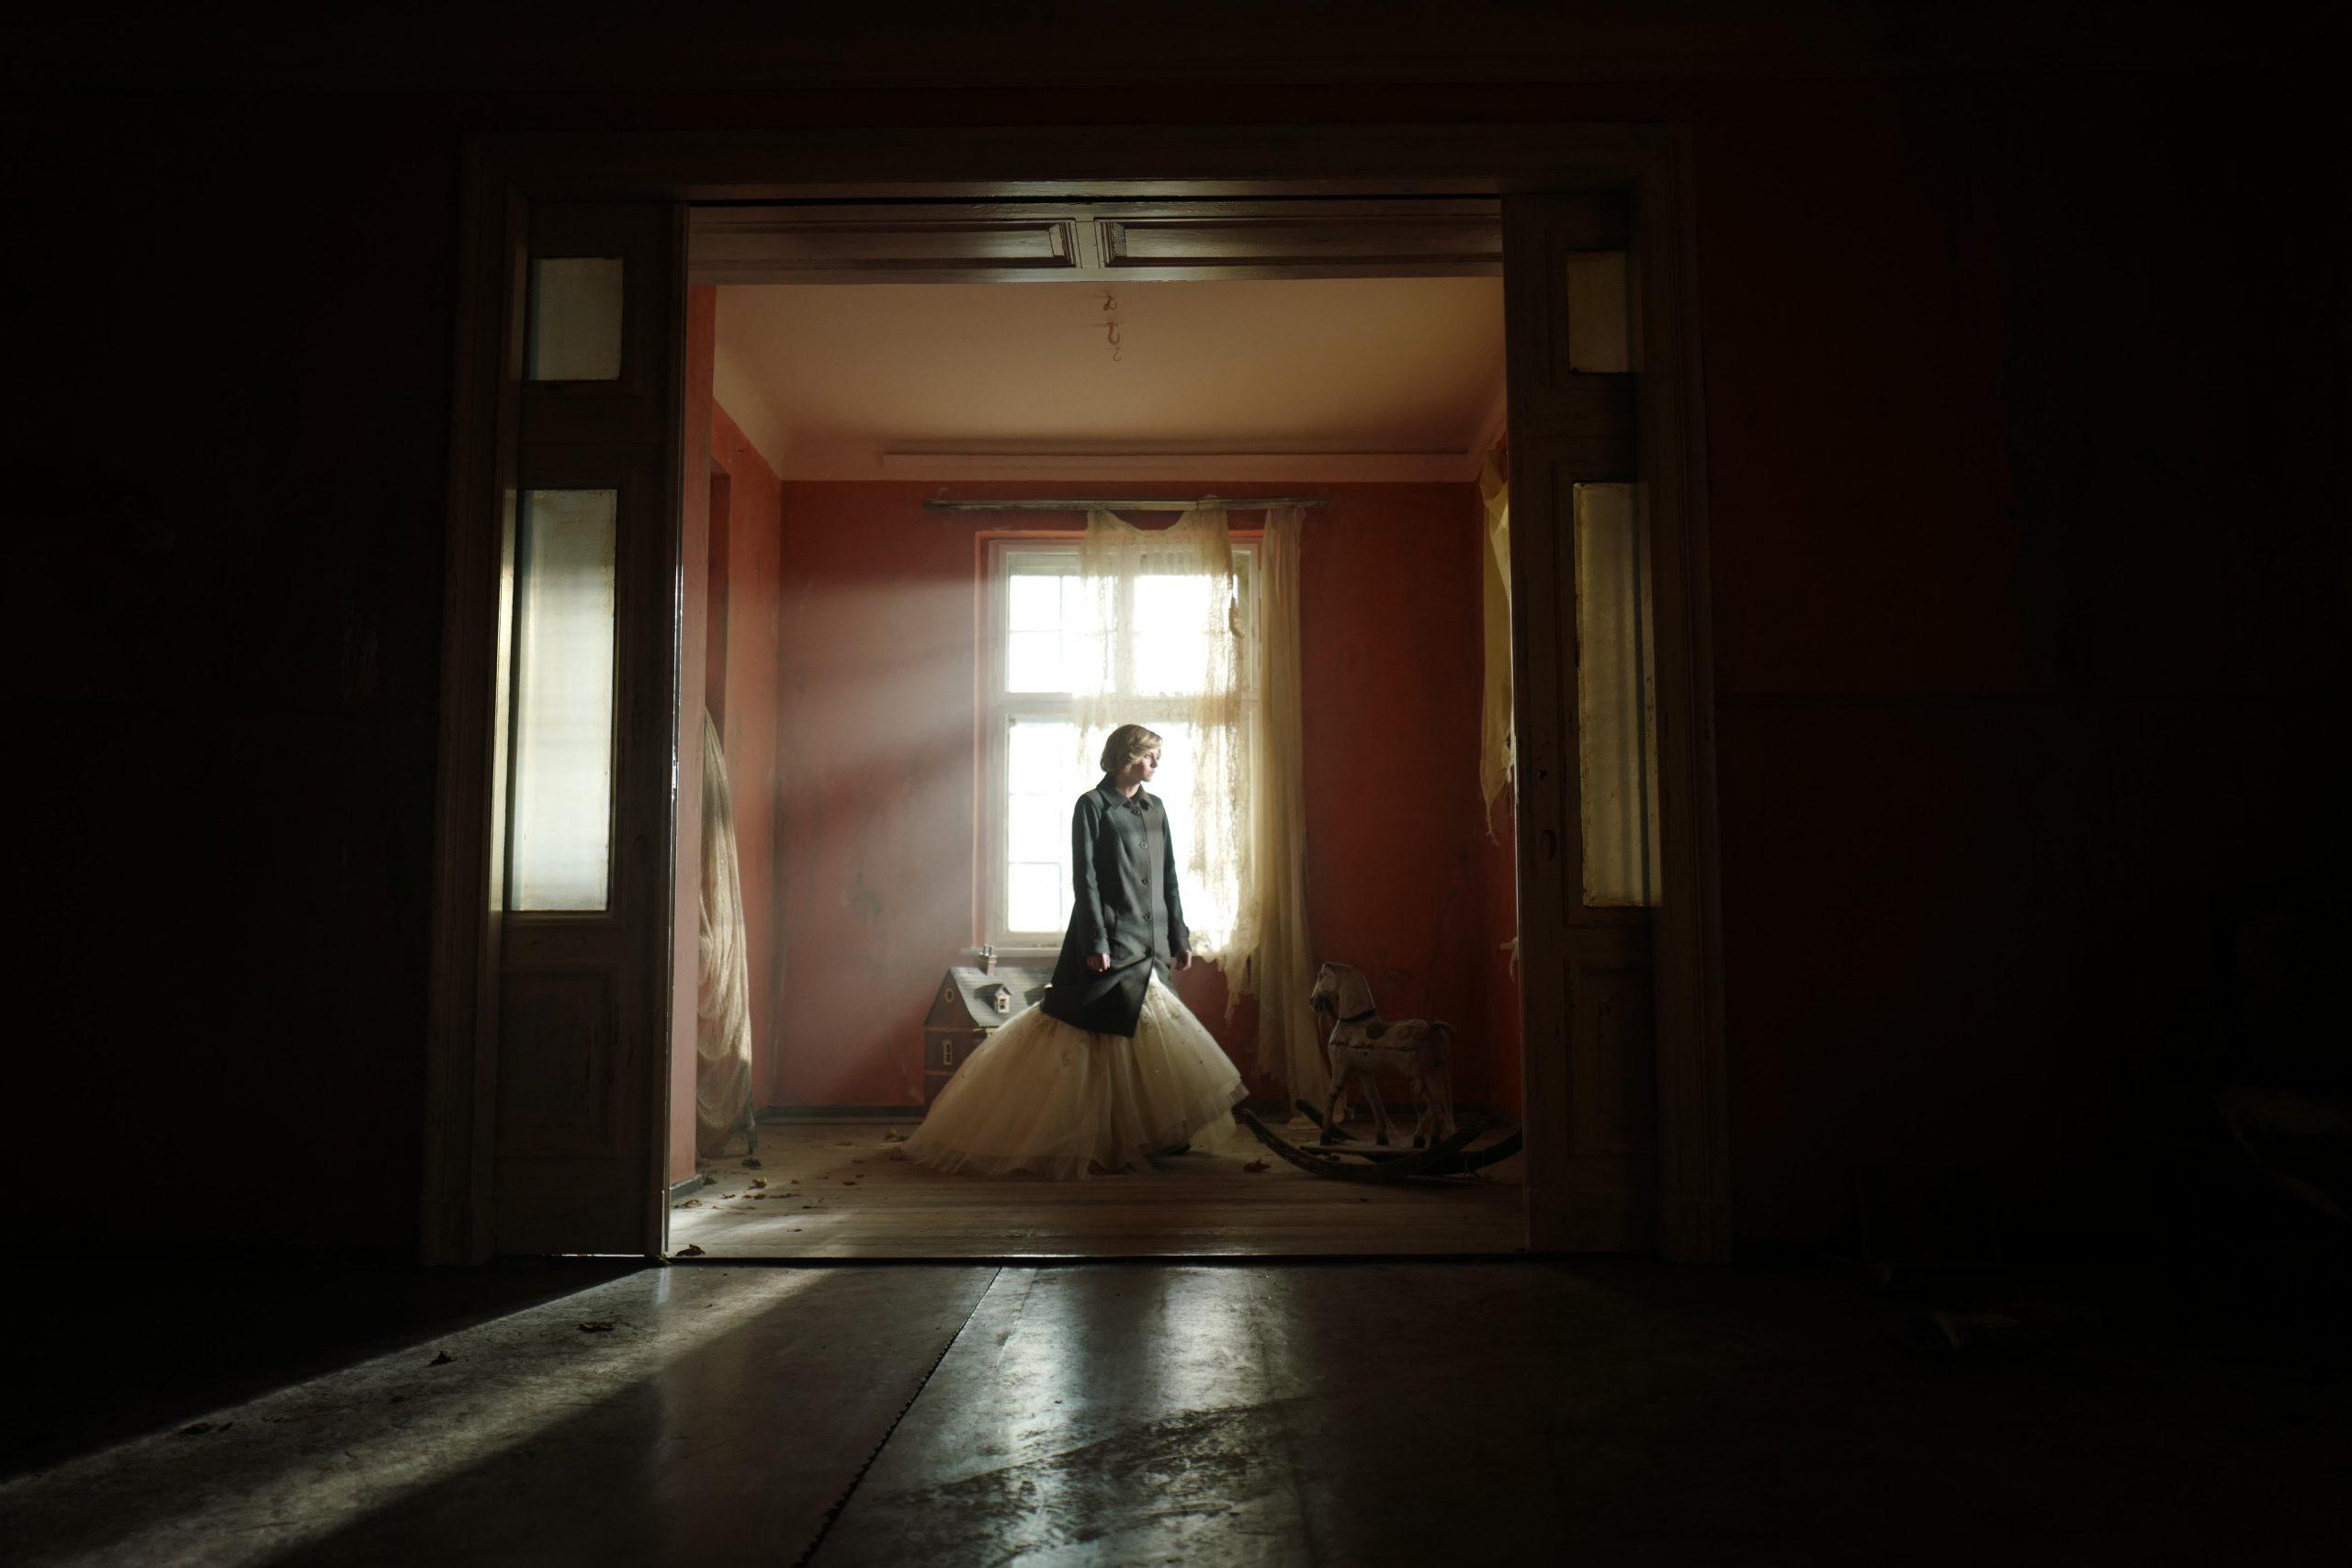 Spencer Trailer: Kristen Stewart Is Coming for All the Awards